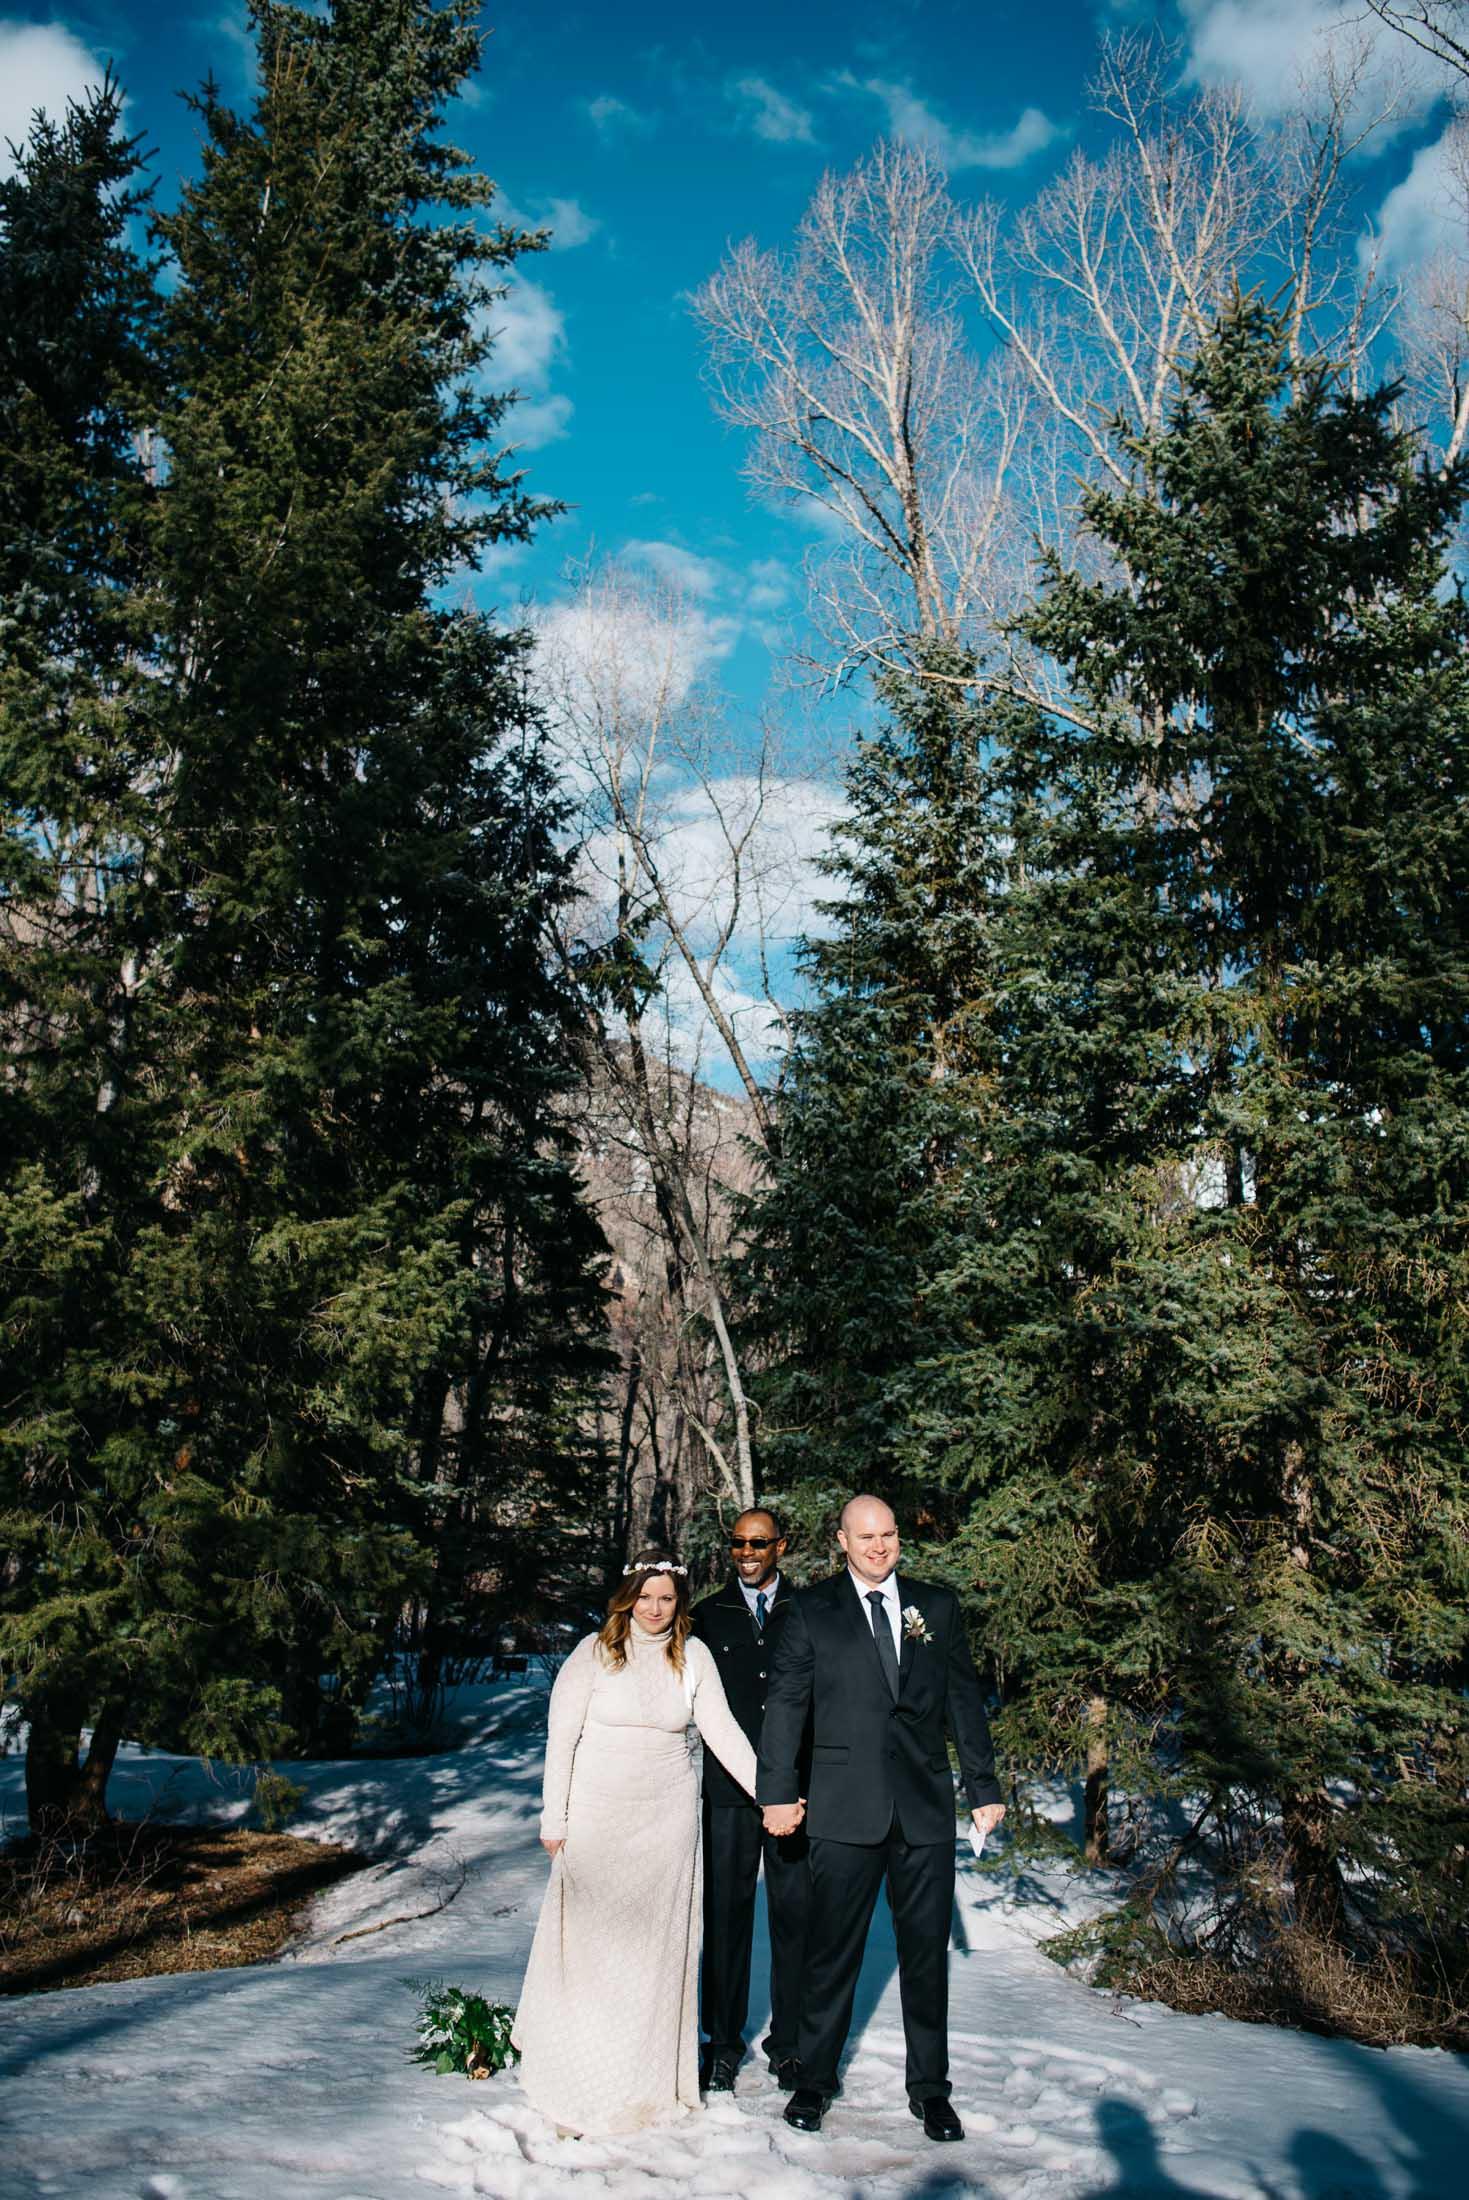 90elopement-photographer-colorado-telluride-winter-wedding-mountain-wedding-photographer-paige&chad-0751.jpg